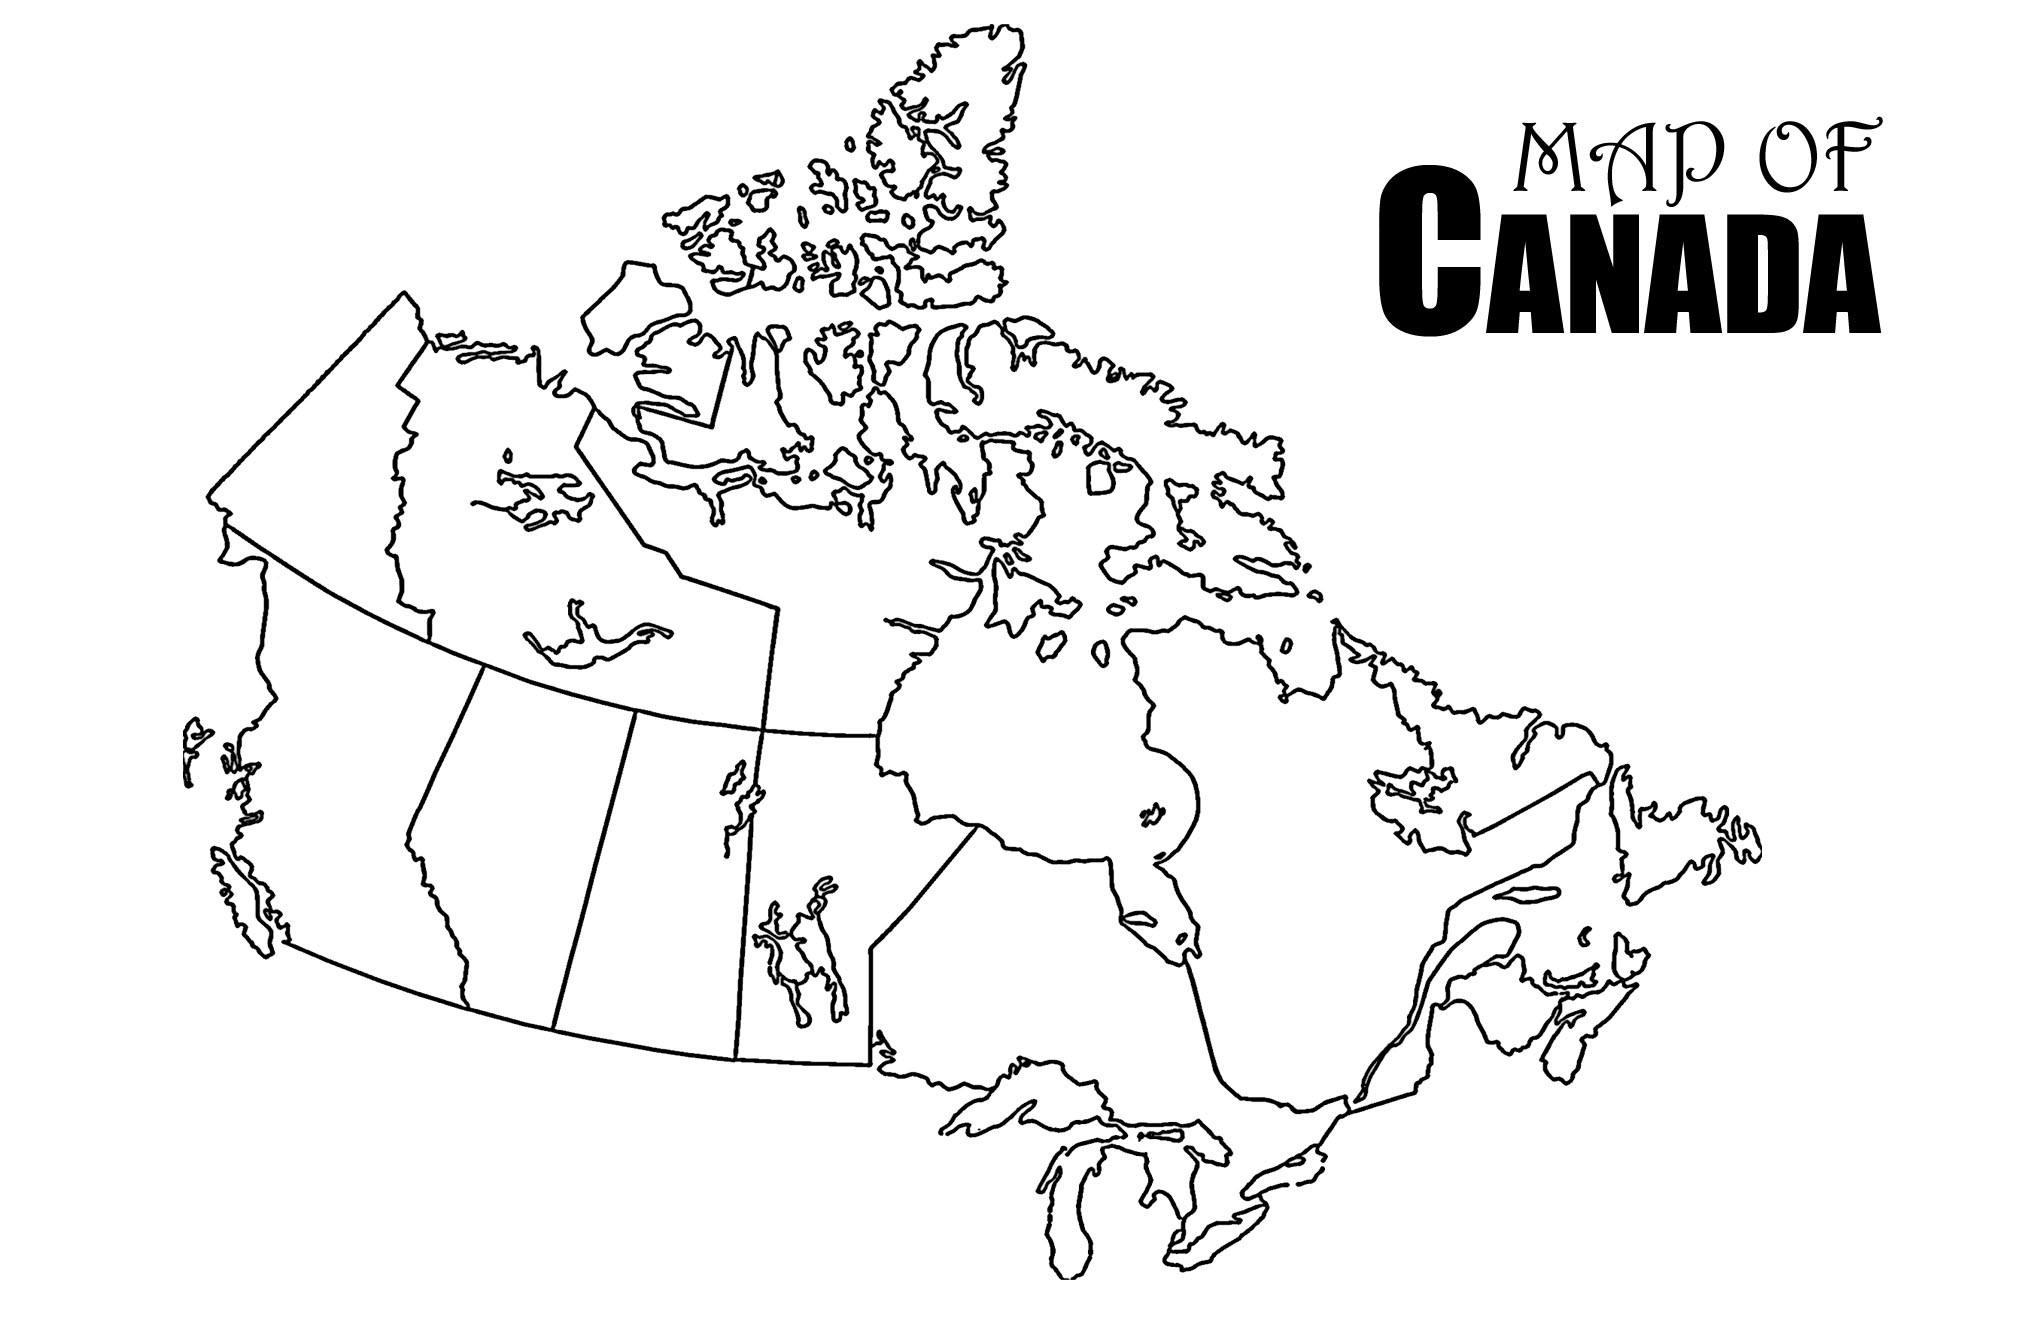 Canada Map Worksheet Free Best Download Blank Canada Map Quiz Of | Free Printable Map Of Canada Worksheet